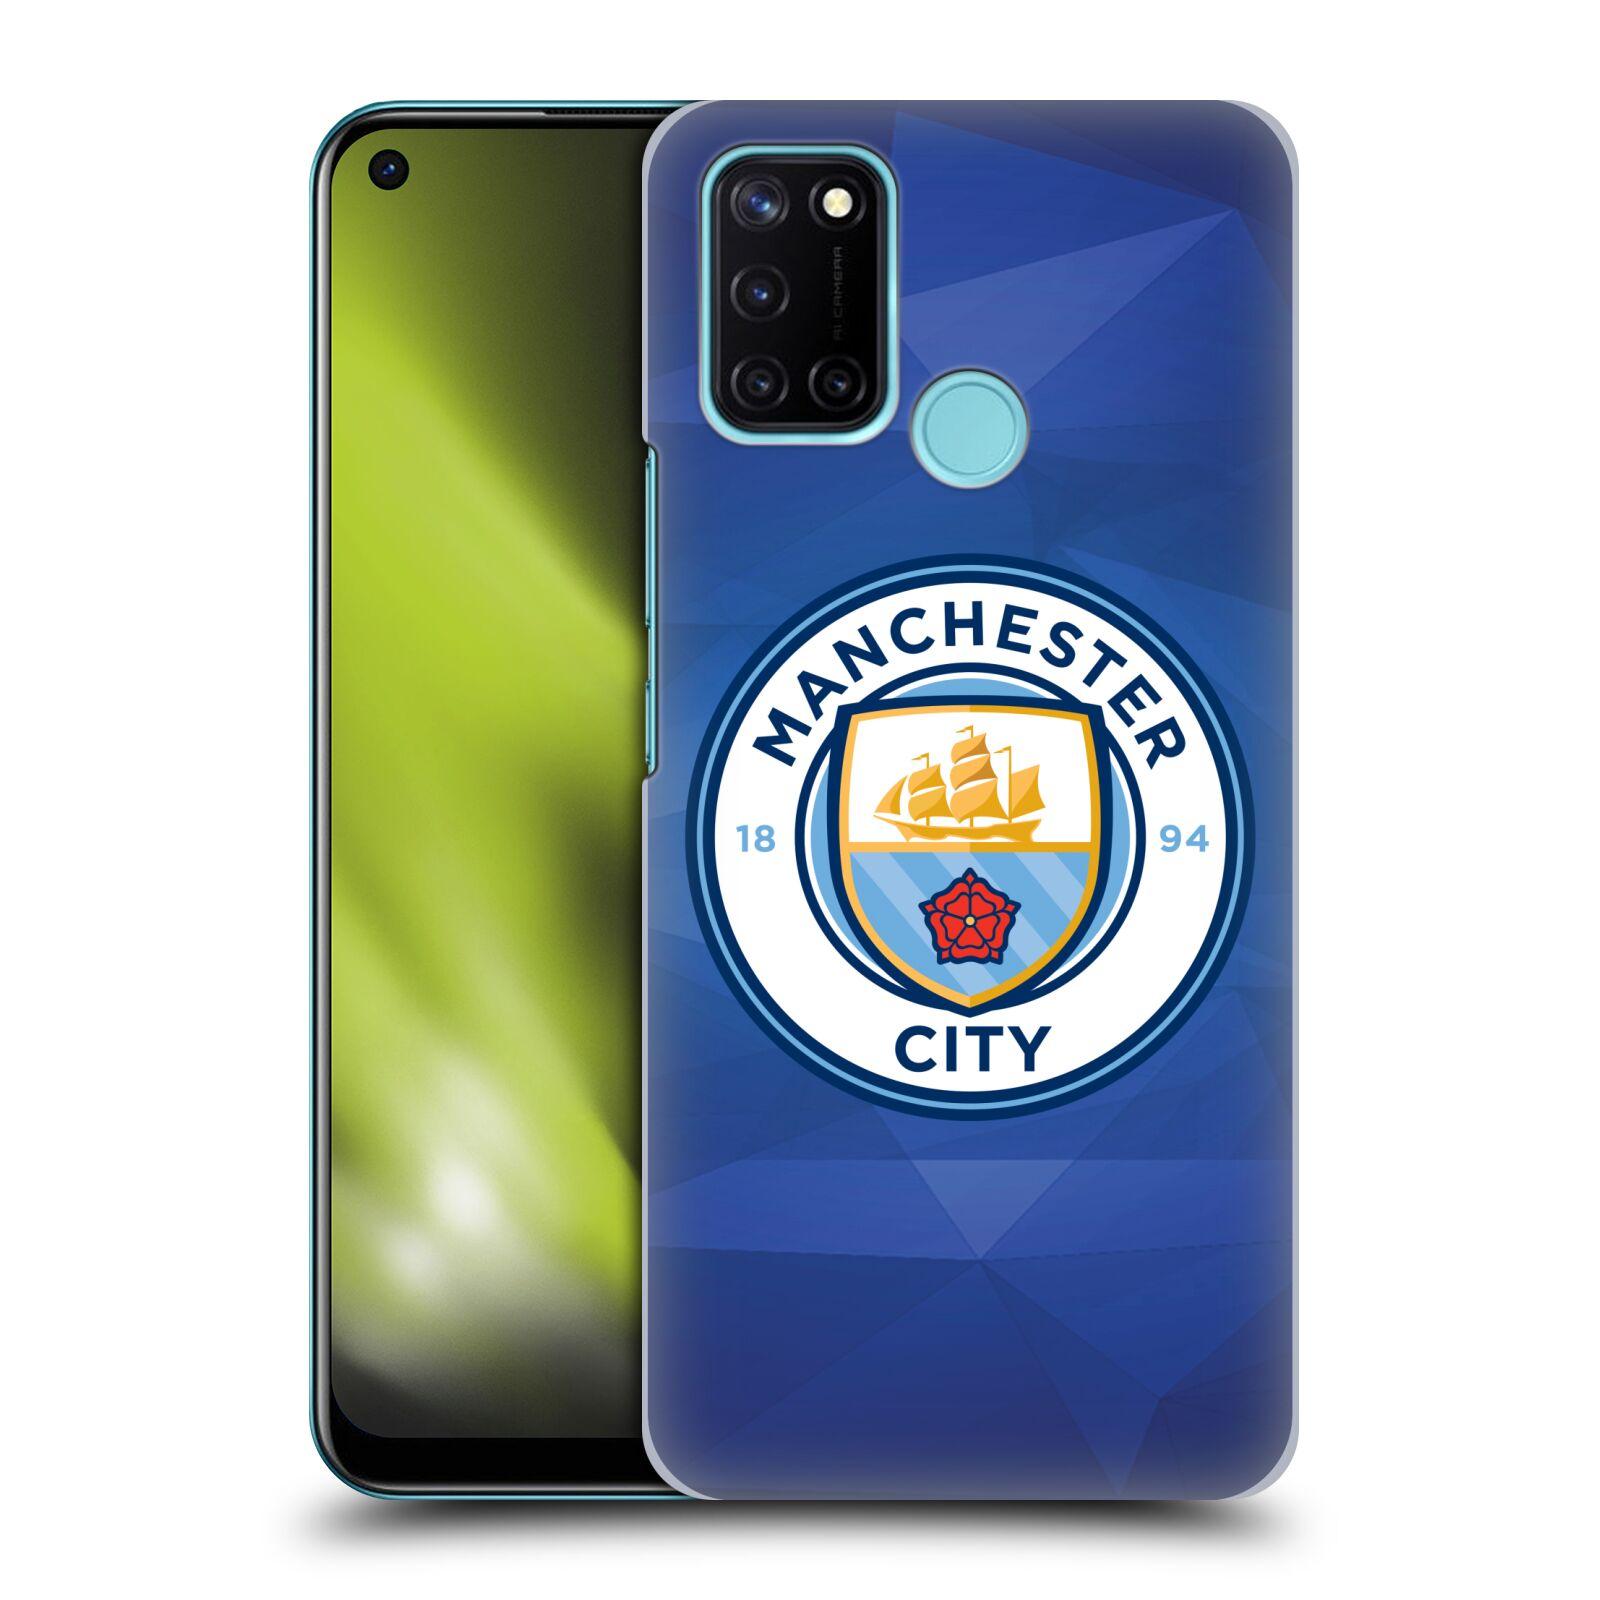 Plastové pouzdro na mobil Realme 7i - Head Case - Manchester City FC - Modré nové logo